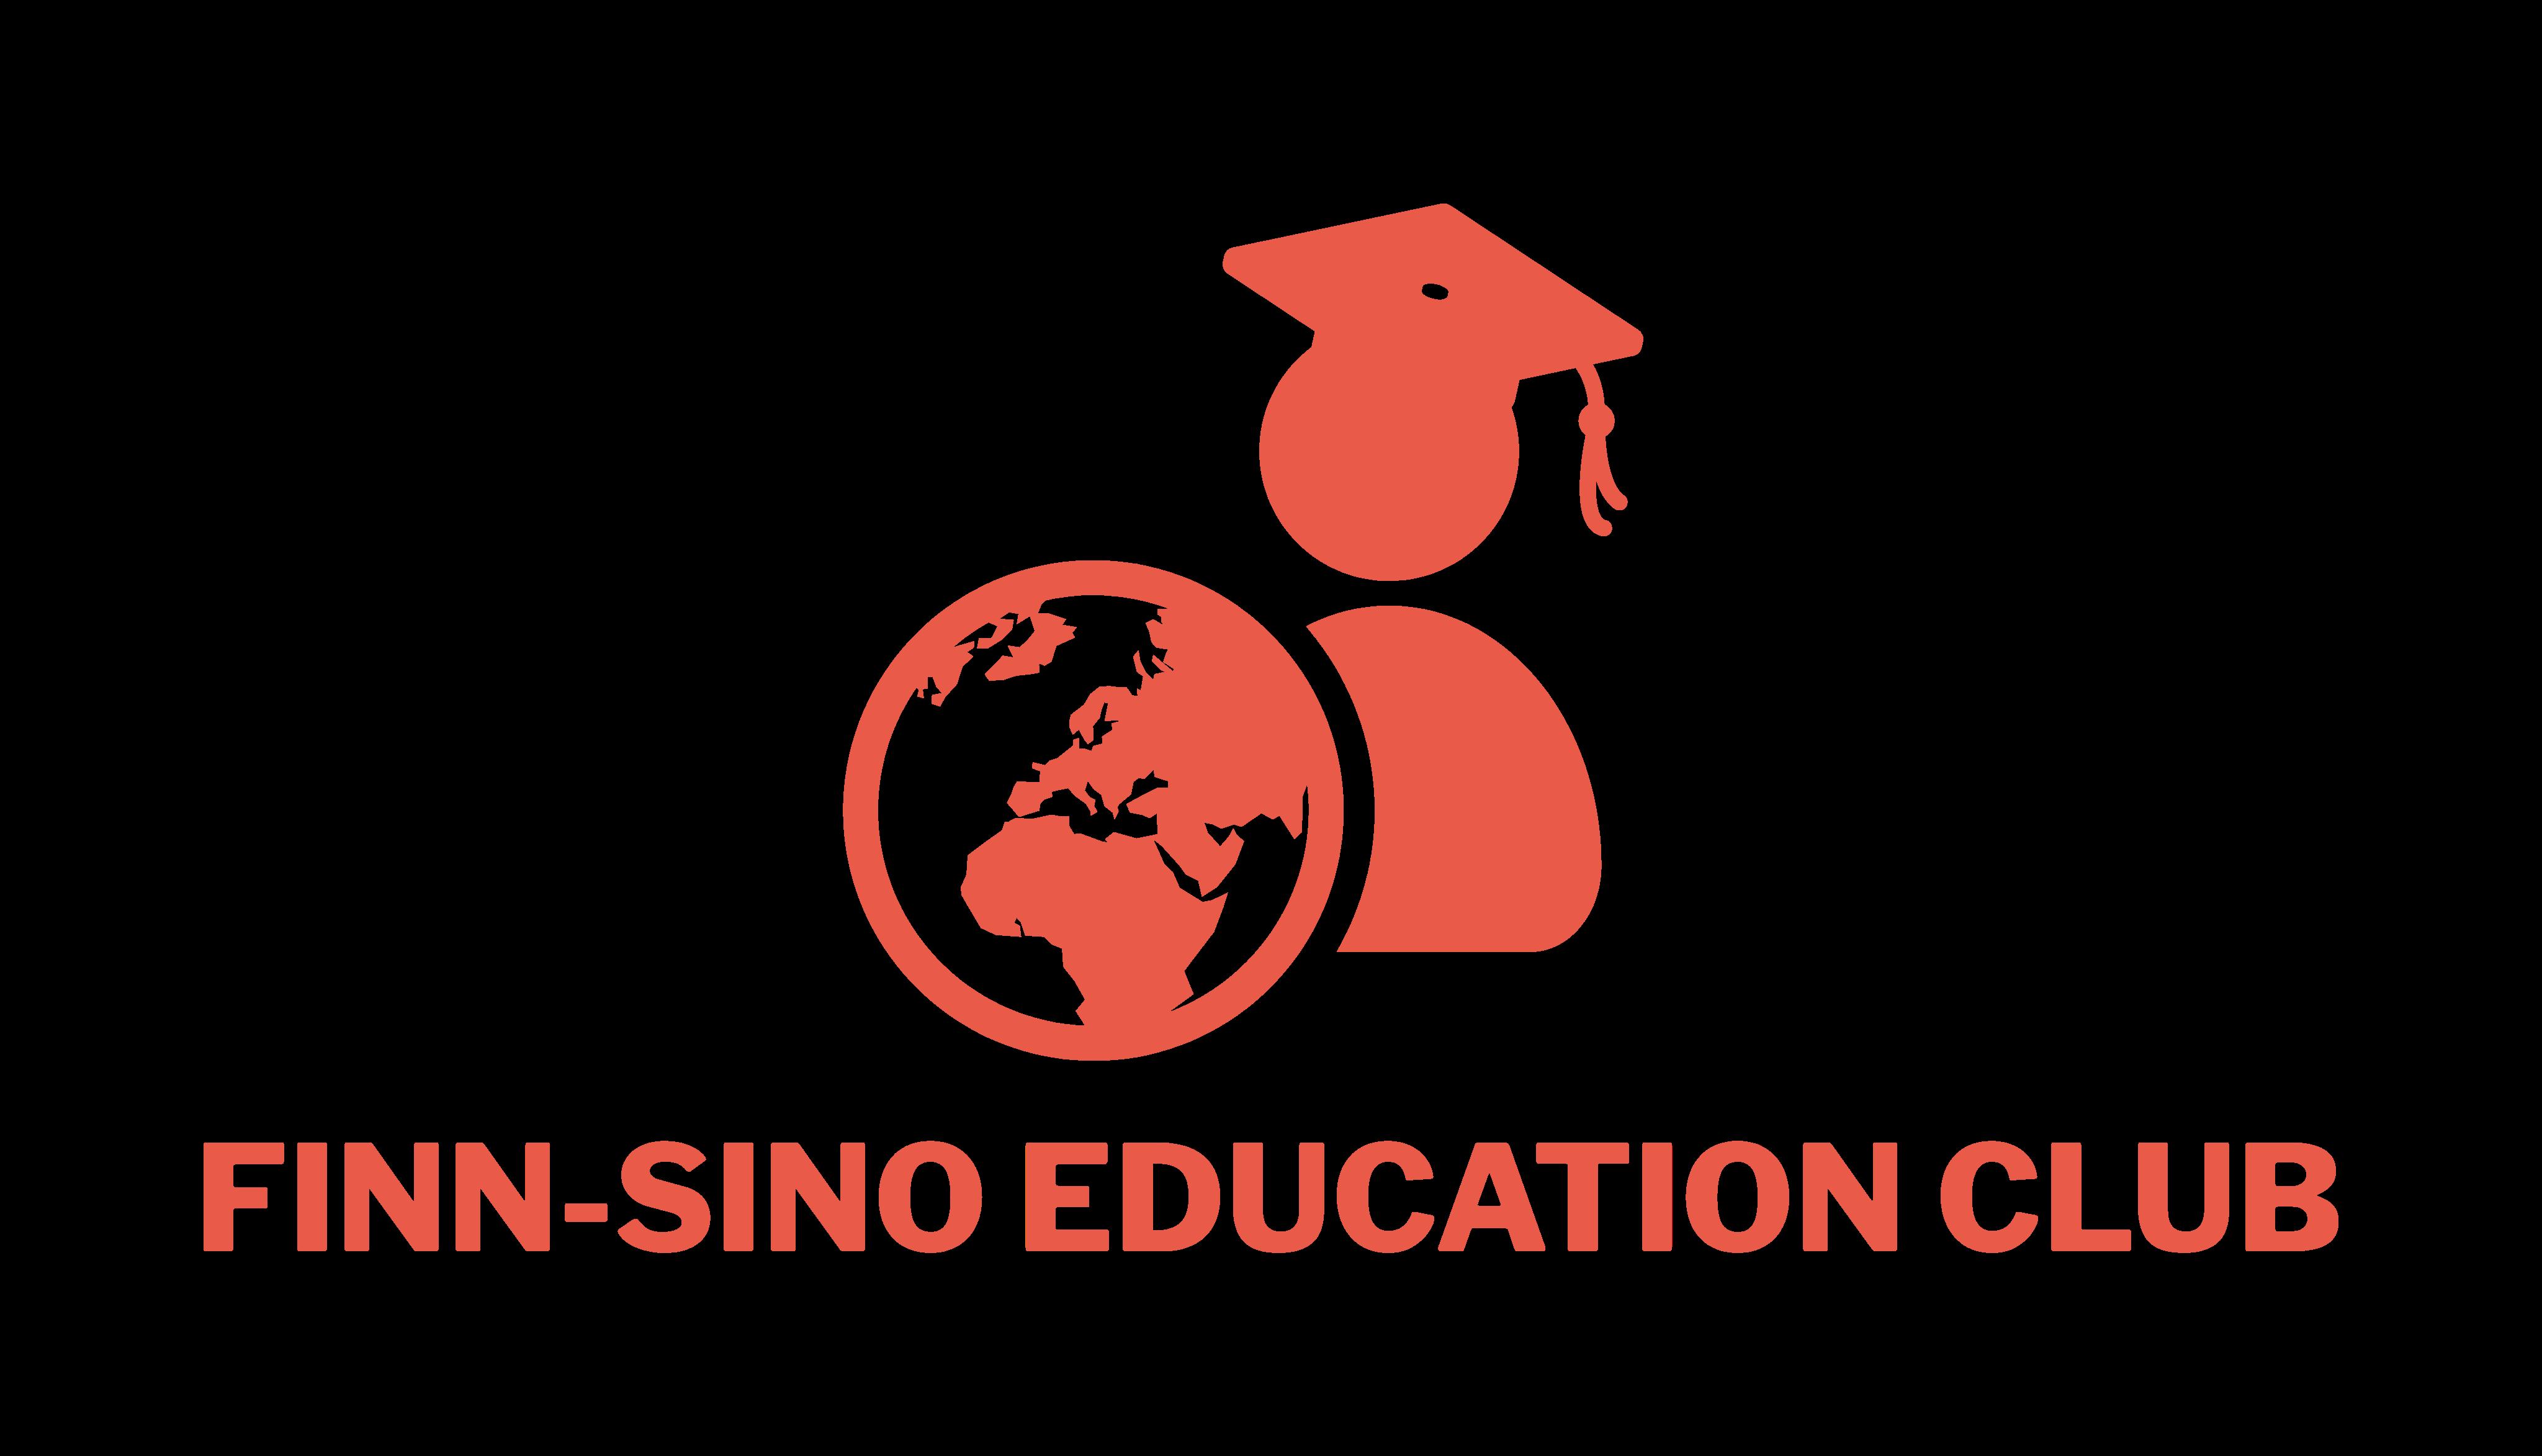 Finn-Sino Association